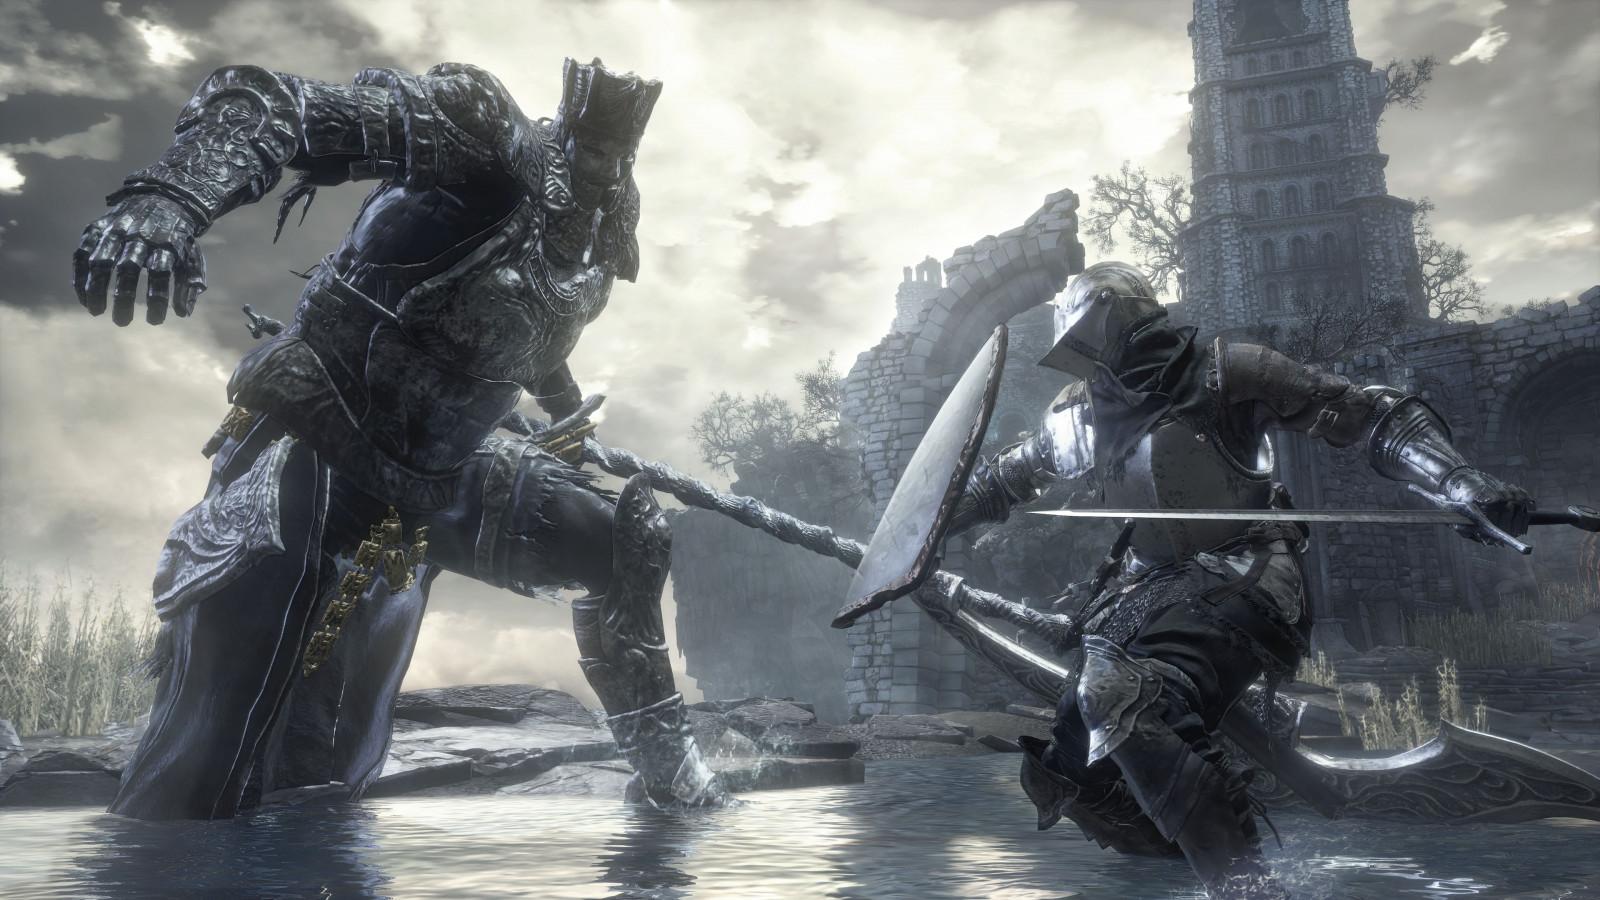 Landscape Dark Soldier Magic Souls III Gothic Midevil Screenshot 3840x2160 Px Knights Pc